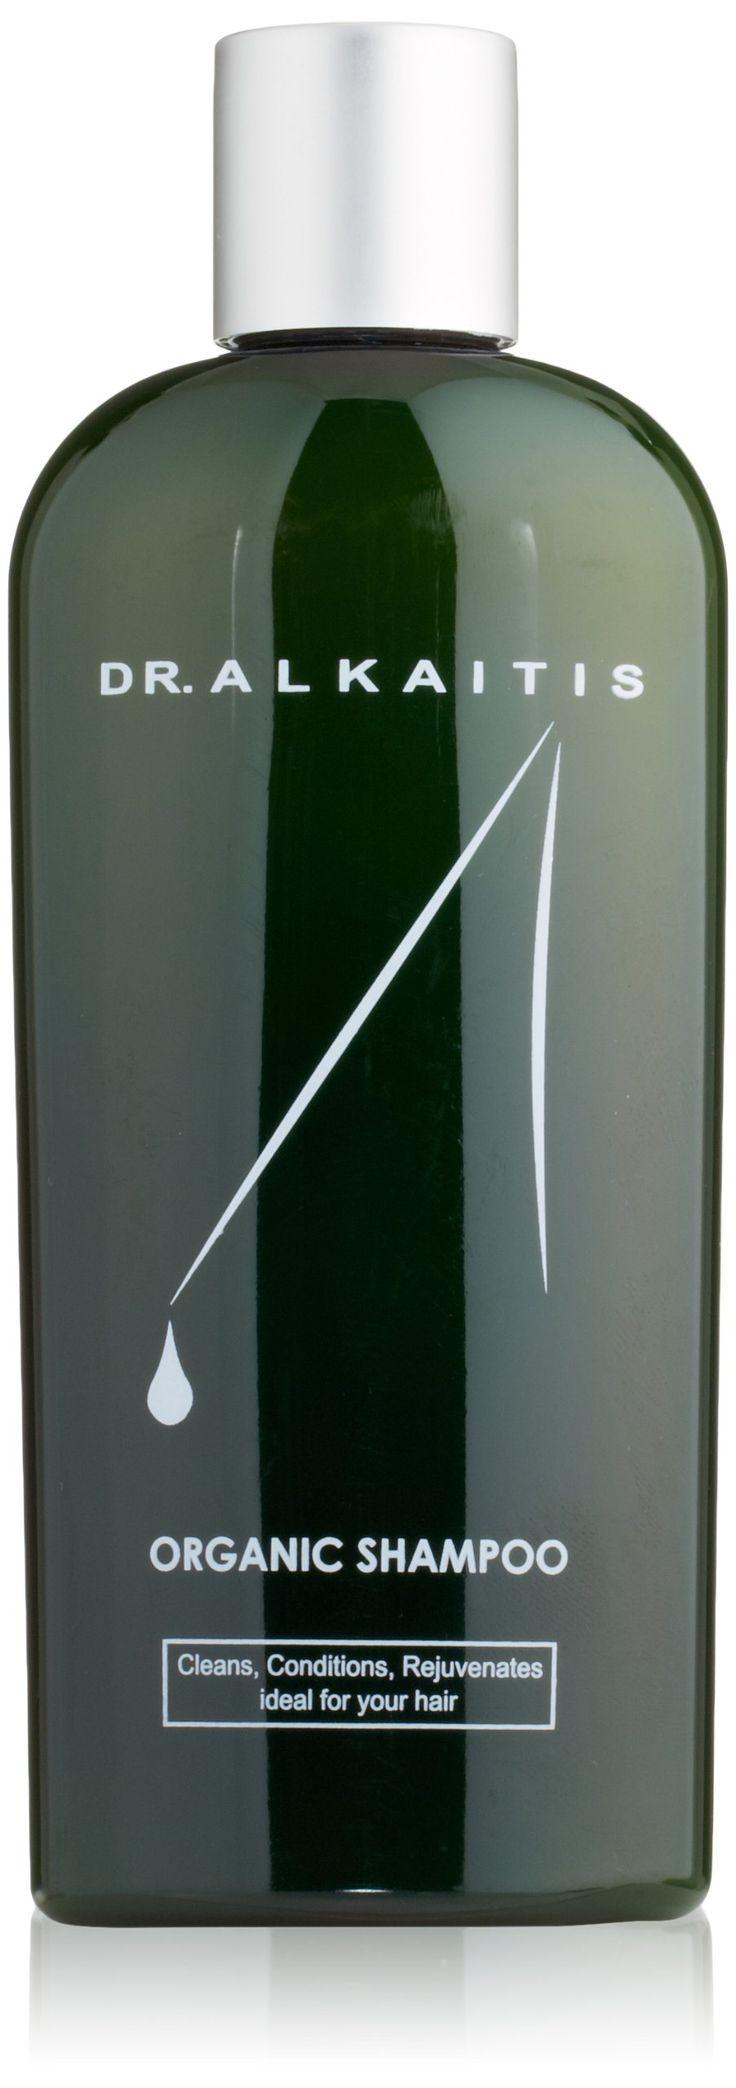 DR. ALKAITIS Organic Herbal Shampoo, 8 fl. oz.